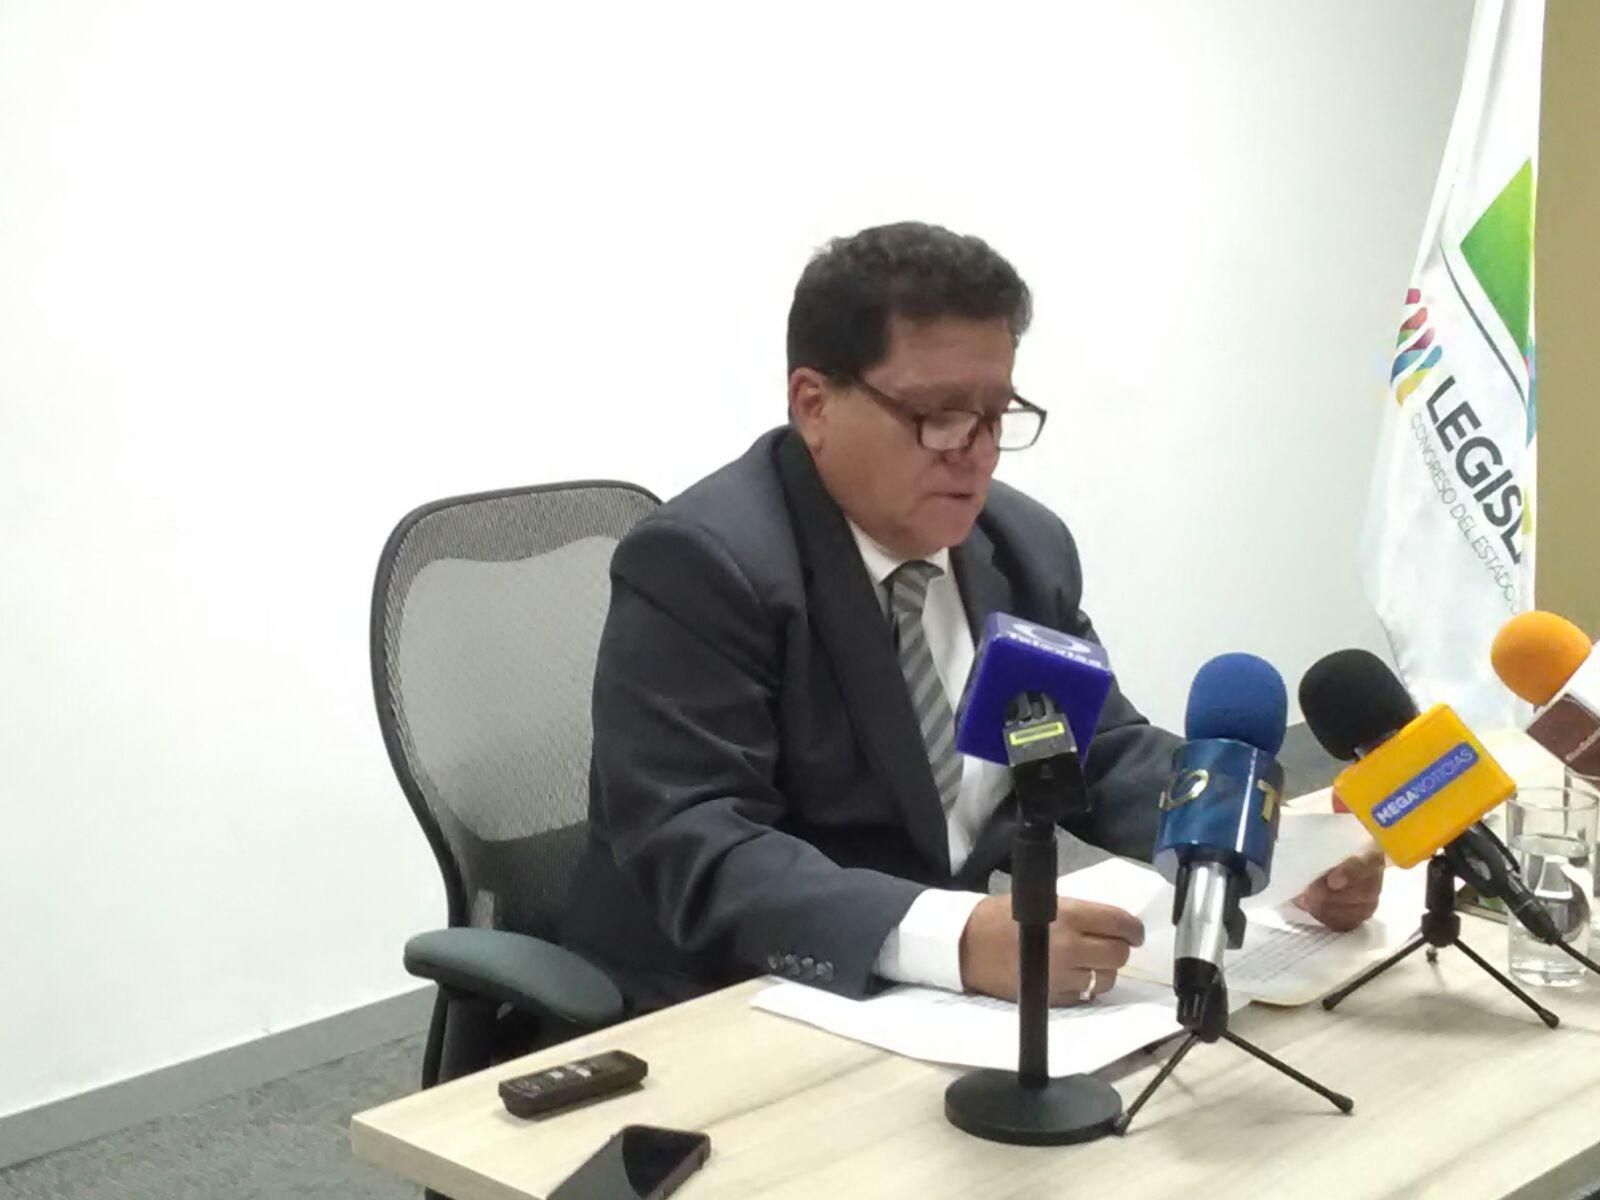 David Landeros Morena